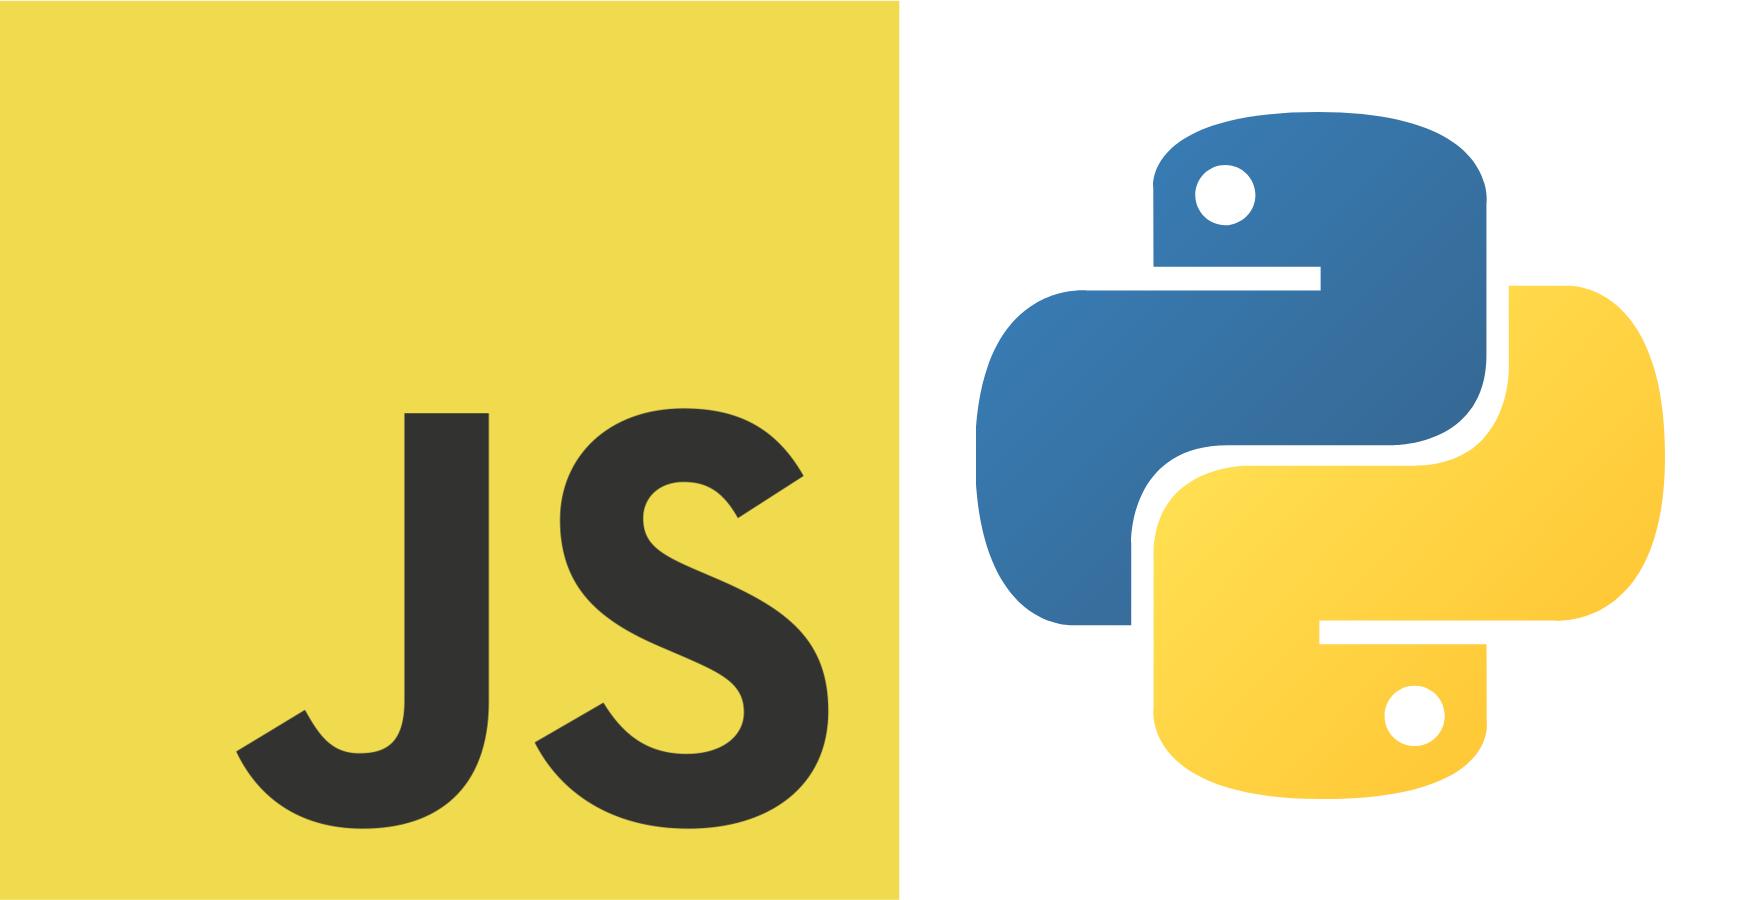 loghi javascript vs python